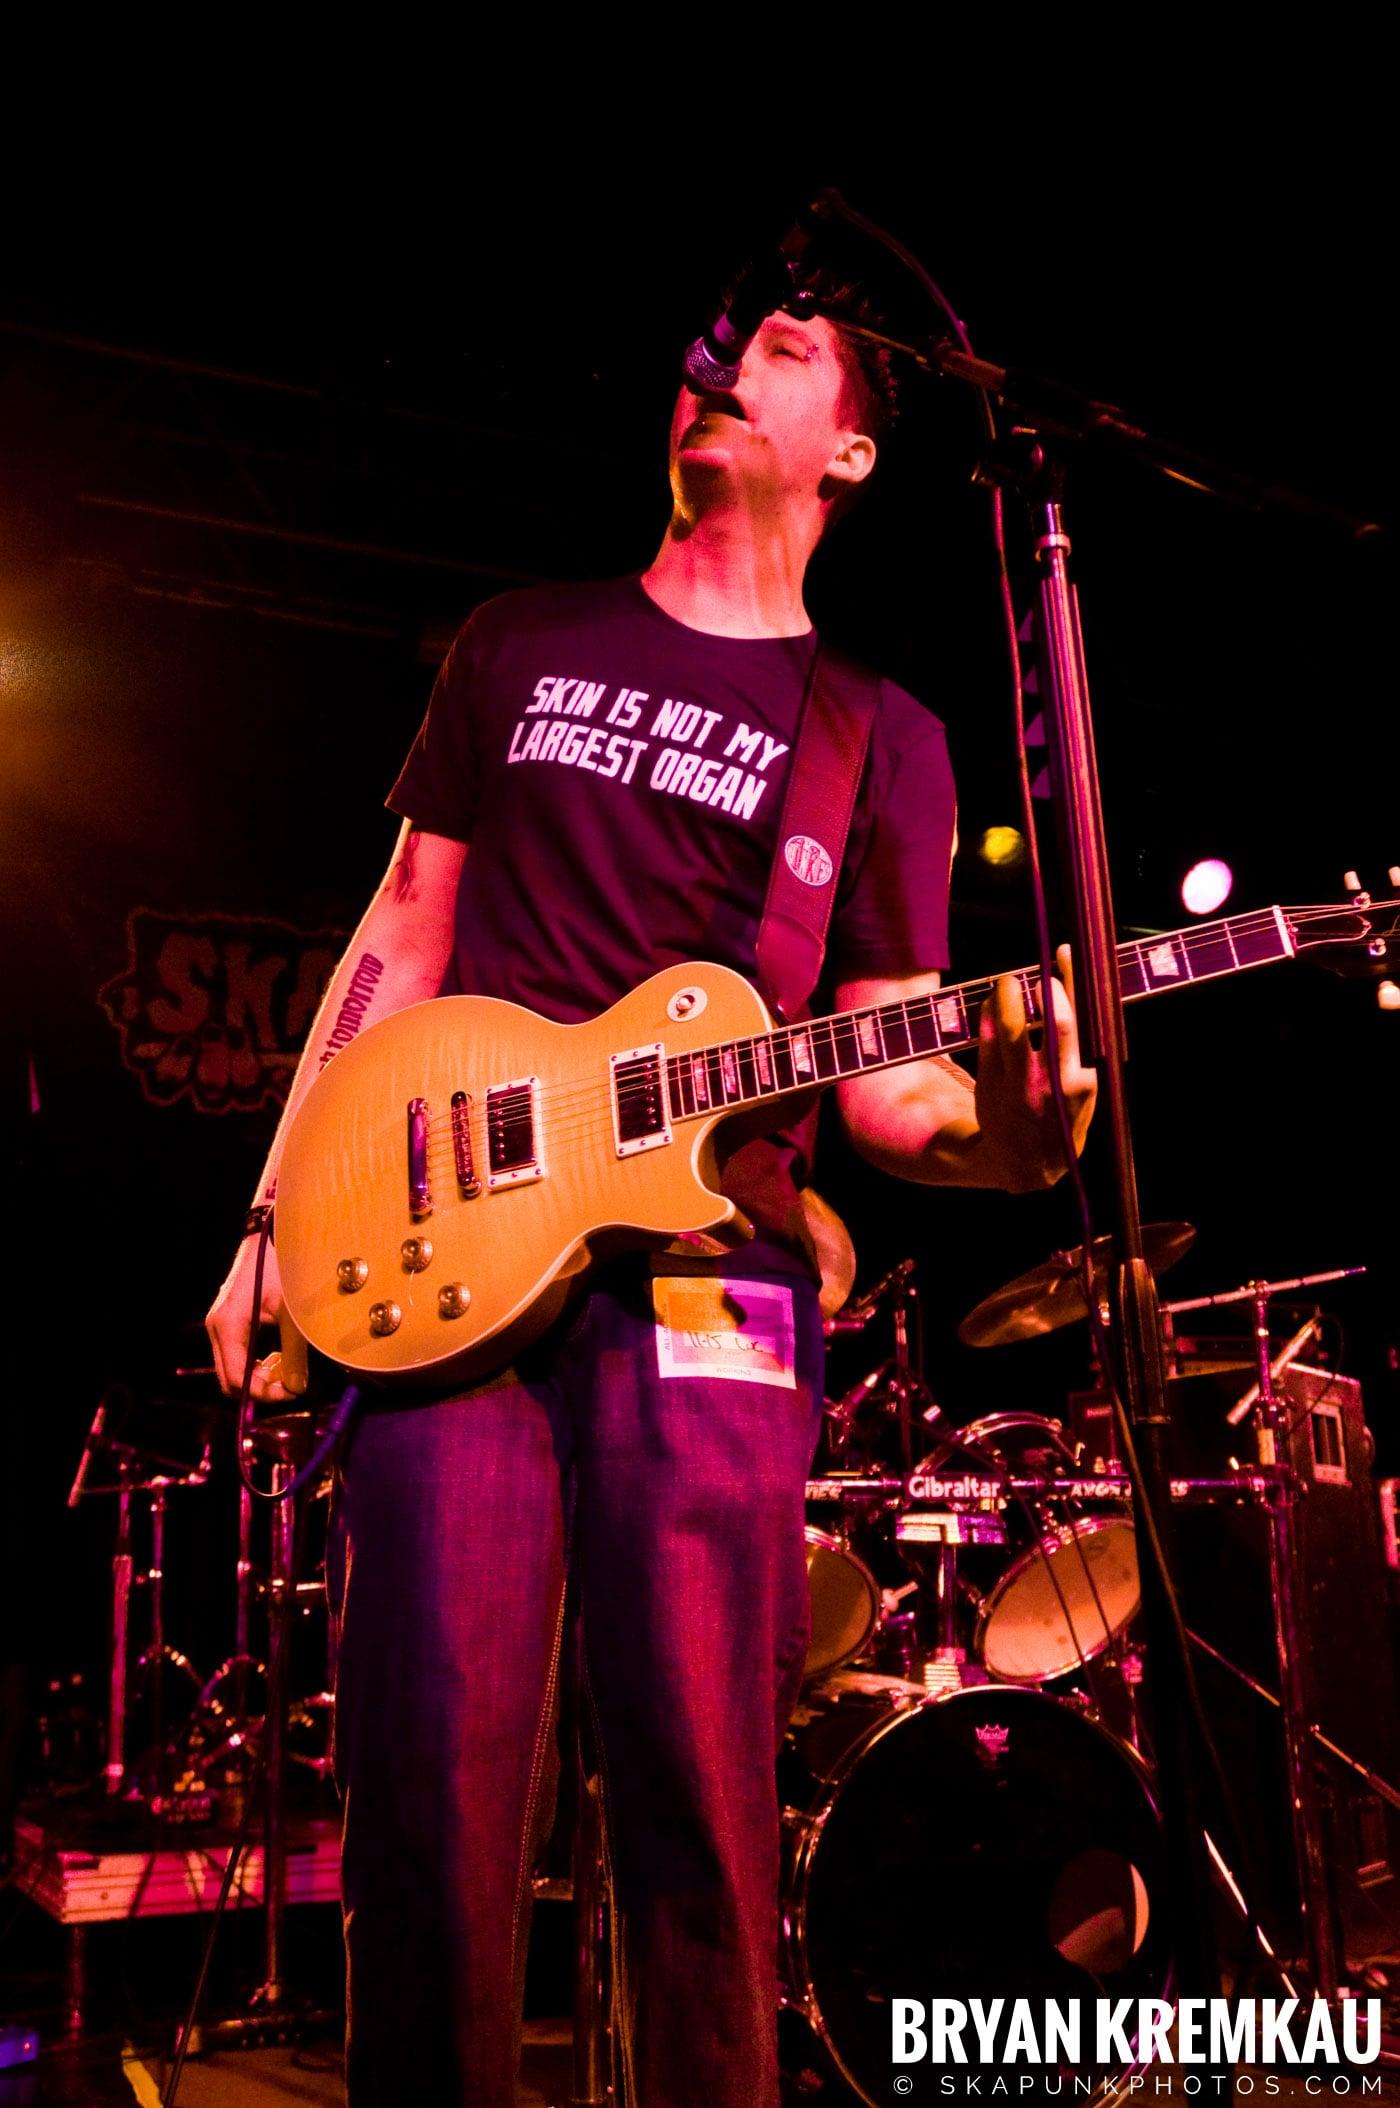 Avon Junkies (Ska is Dead Tour) @ Starland Ballroom, Sayreville, NJ - 11.15.09 (7)